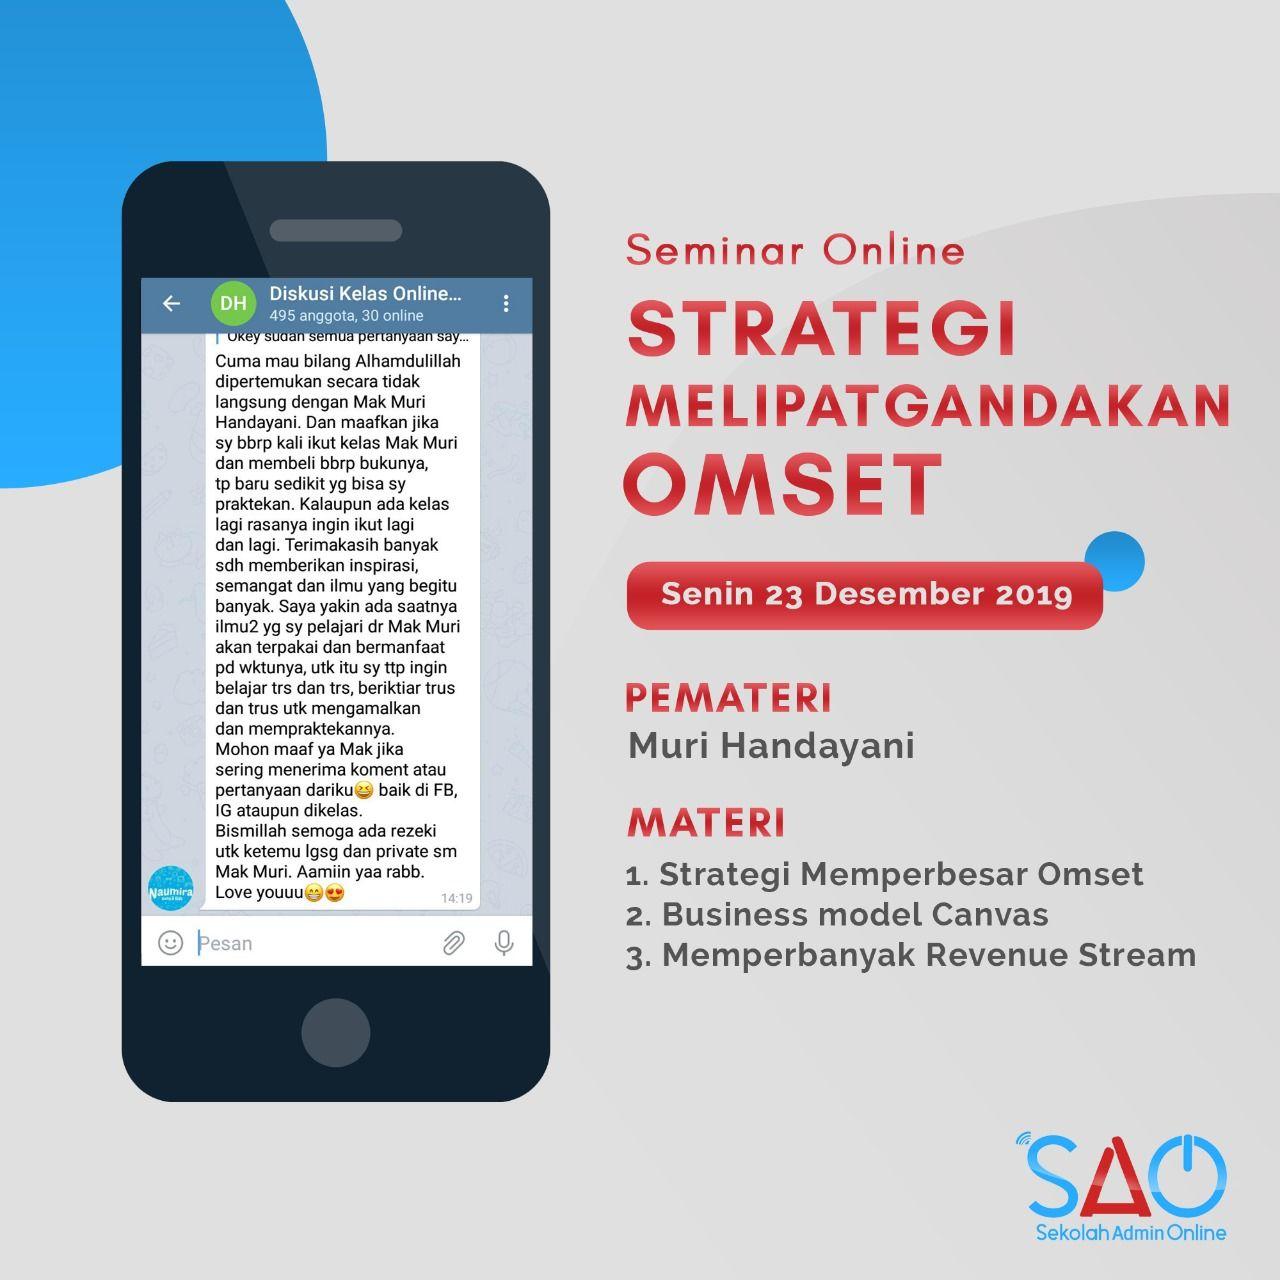 Sekolah Admin Online Seminar Online Startegi Melipatgandakan Omset Online Seminar Phone